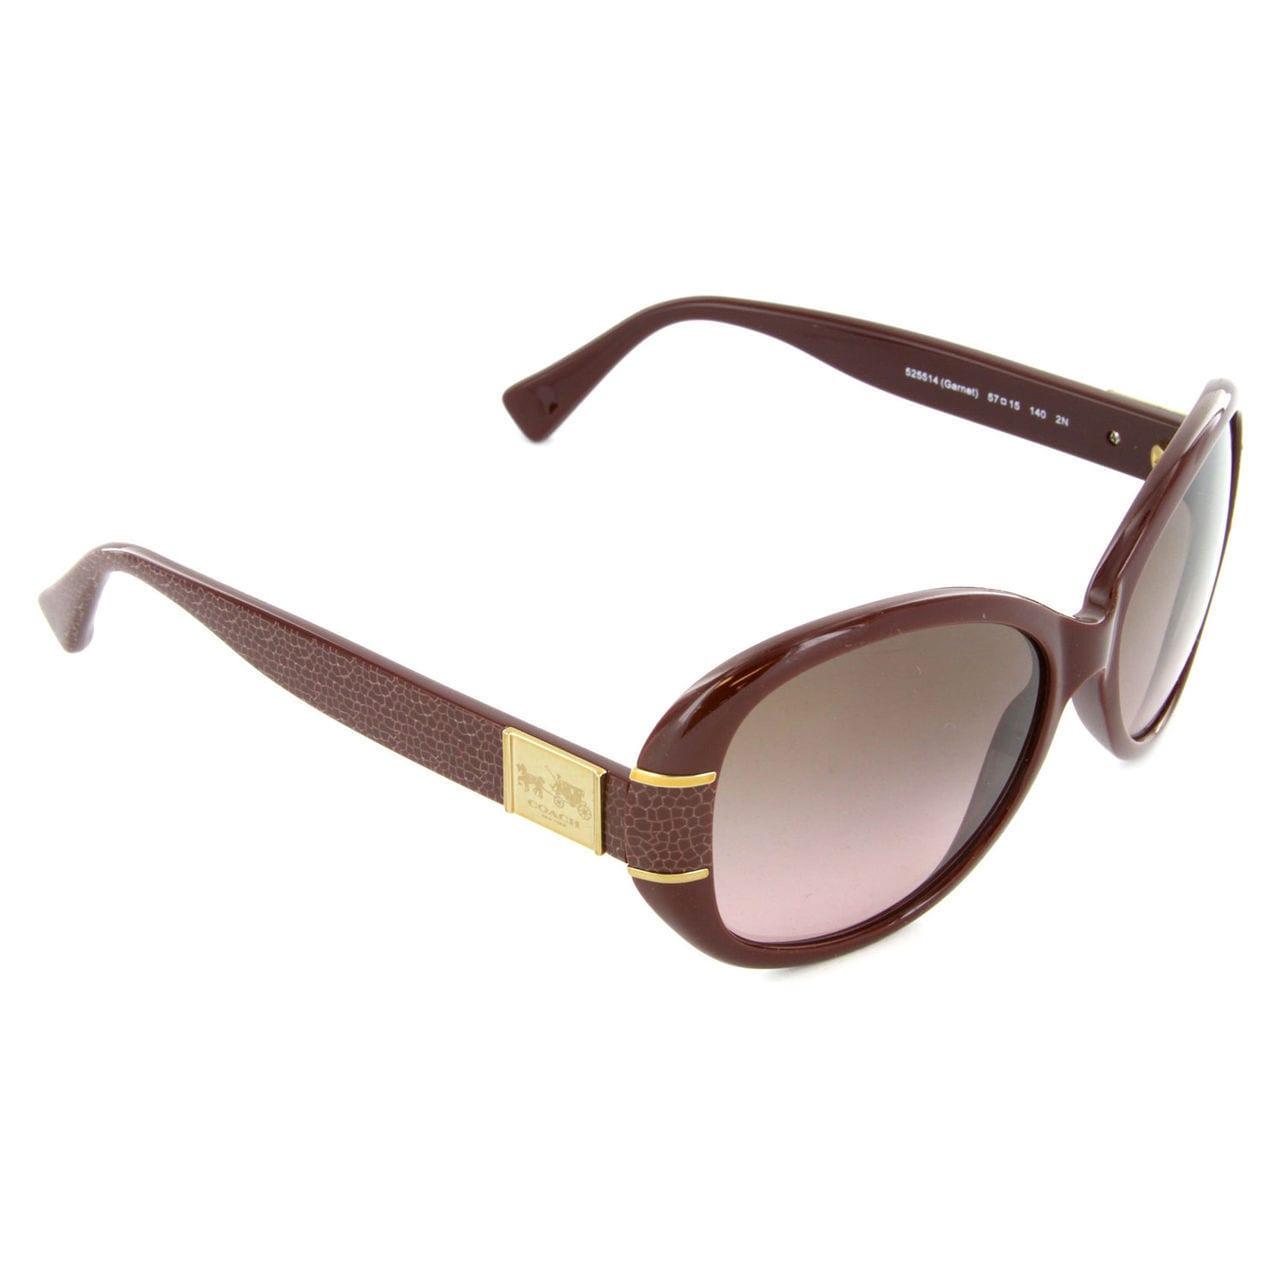 c2a94a1f4019 Shop Coach Women's HC8115 L086 Blaine 525514 Plastic Oval Sunglasses - Free  Shipping Today - Overstock.com - 10324830